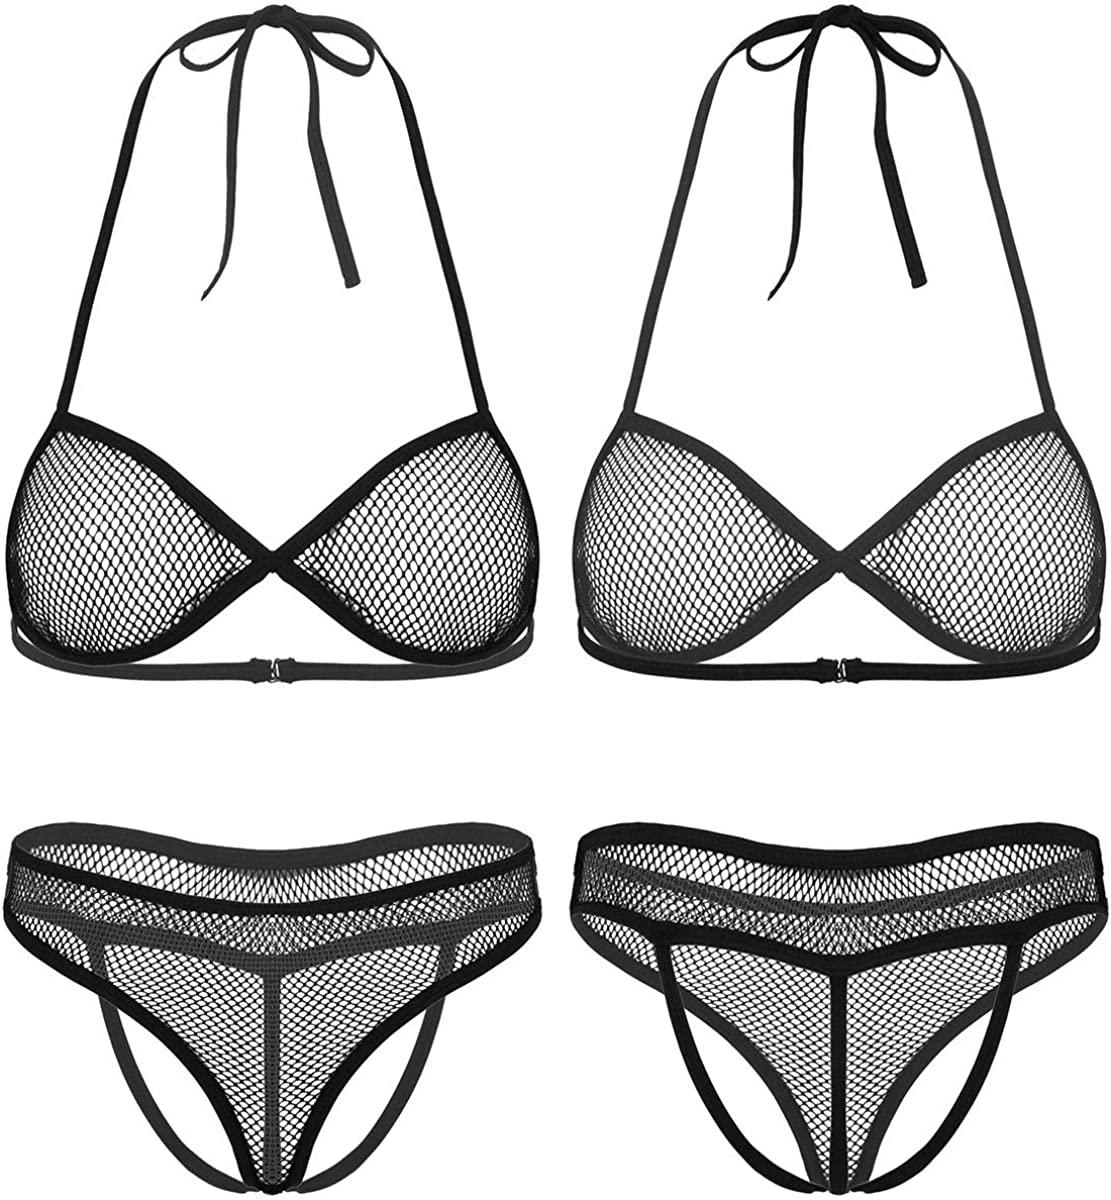 CHICTRY 2Pcs Womens Hot Sheer Fishnet Lingerie Set Deep V Front Bikini Bra Top Crotchless G-String